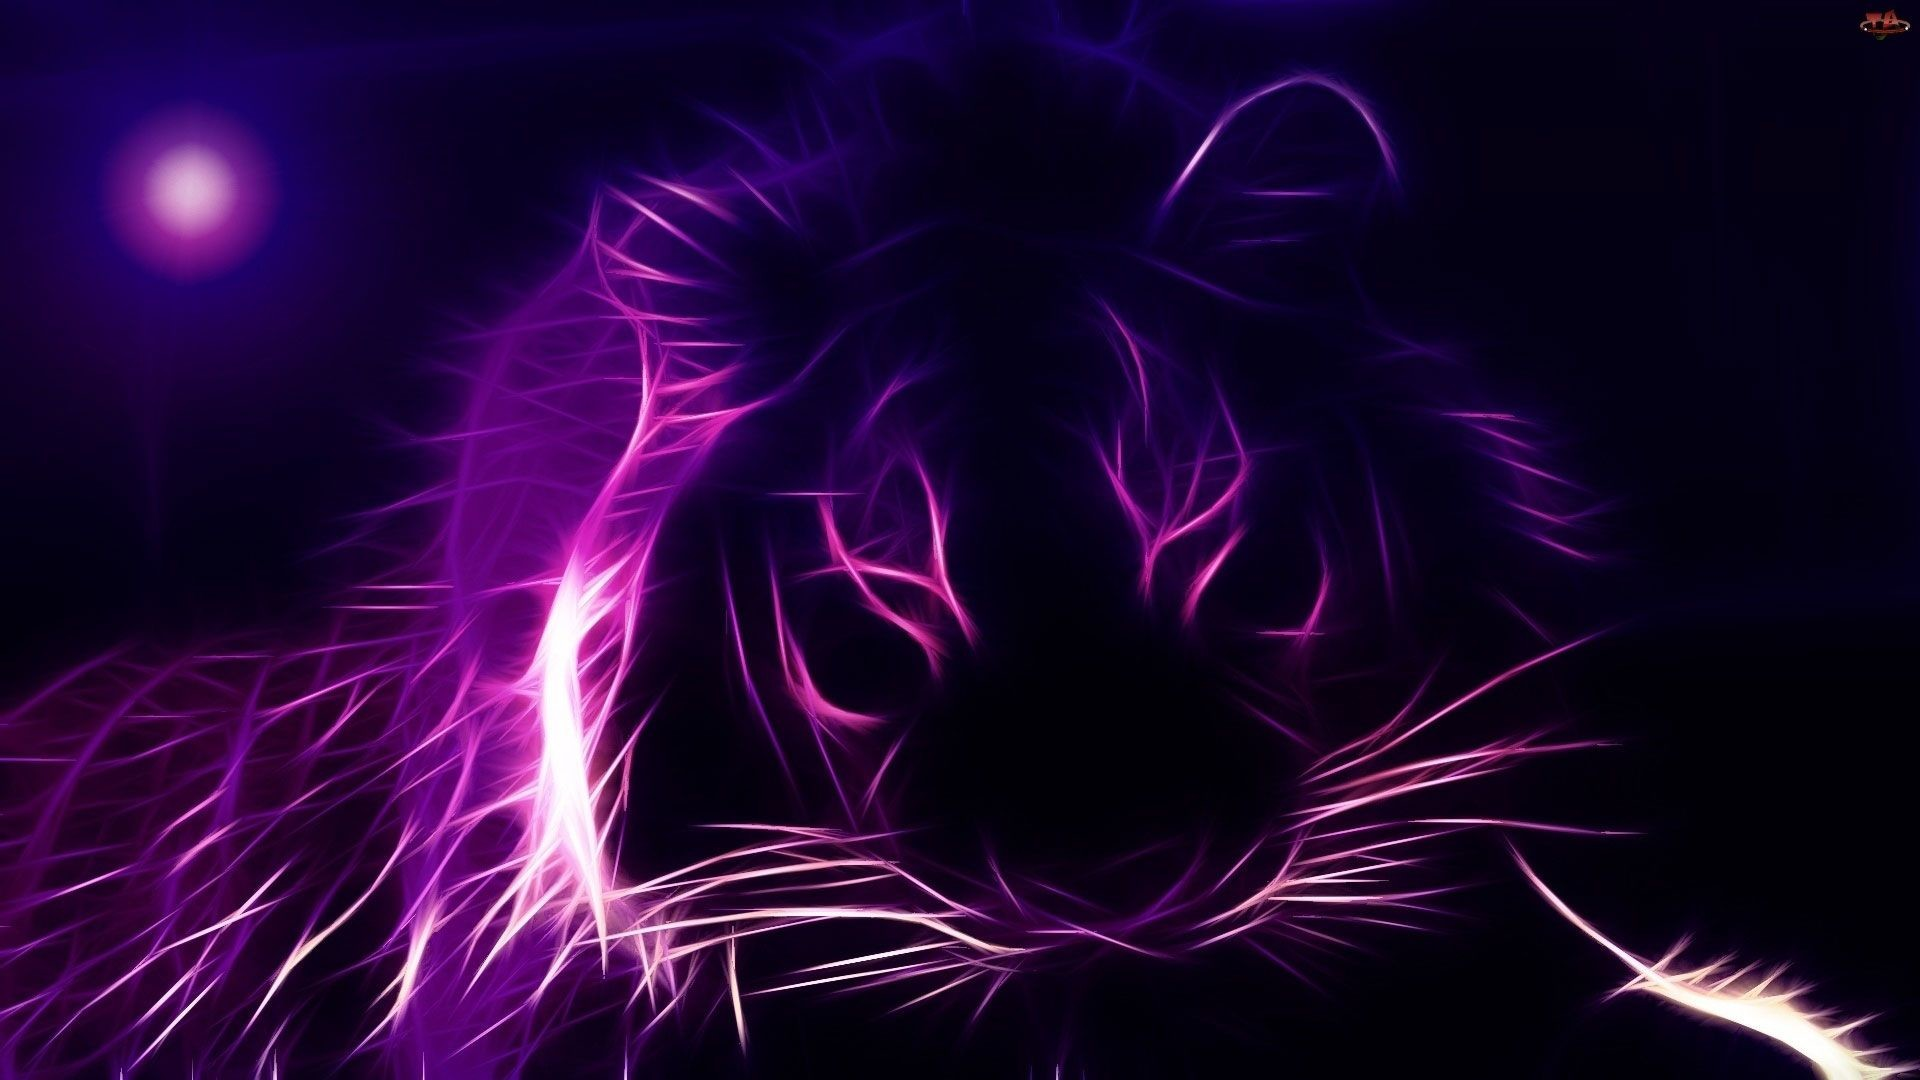 Res: 1920x1080, Wallpaperviolet by ZecoP on DeviantArt 1920×1200 Violet Wallpaper (51  Wallpapers) | Adorable